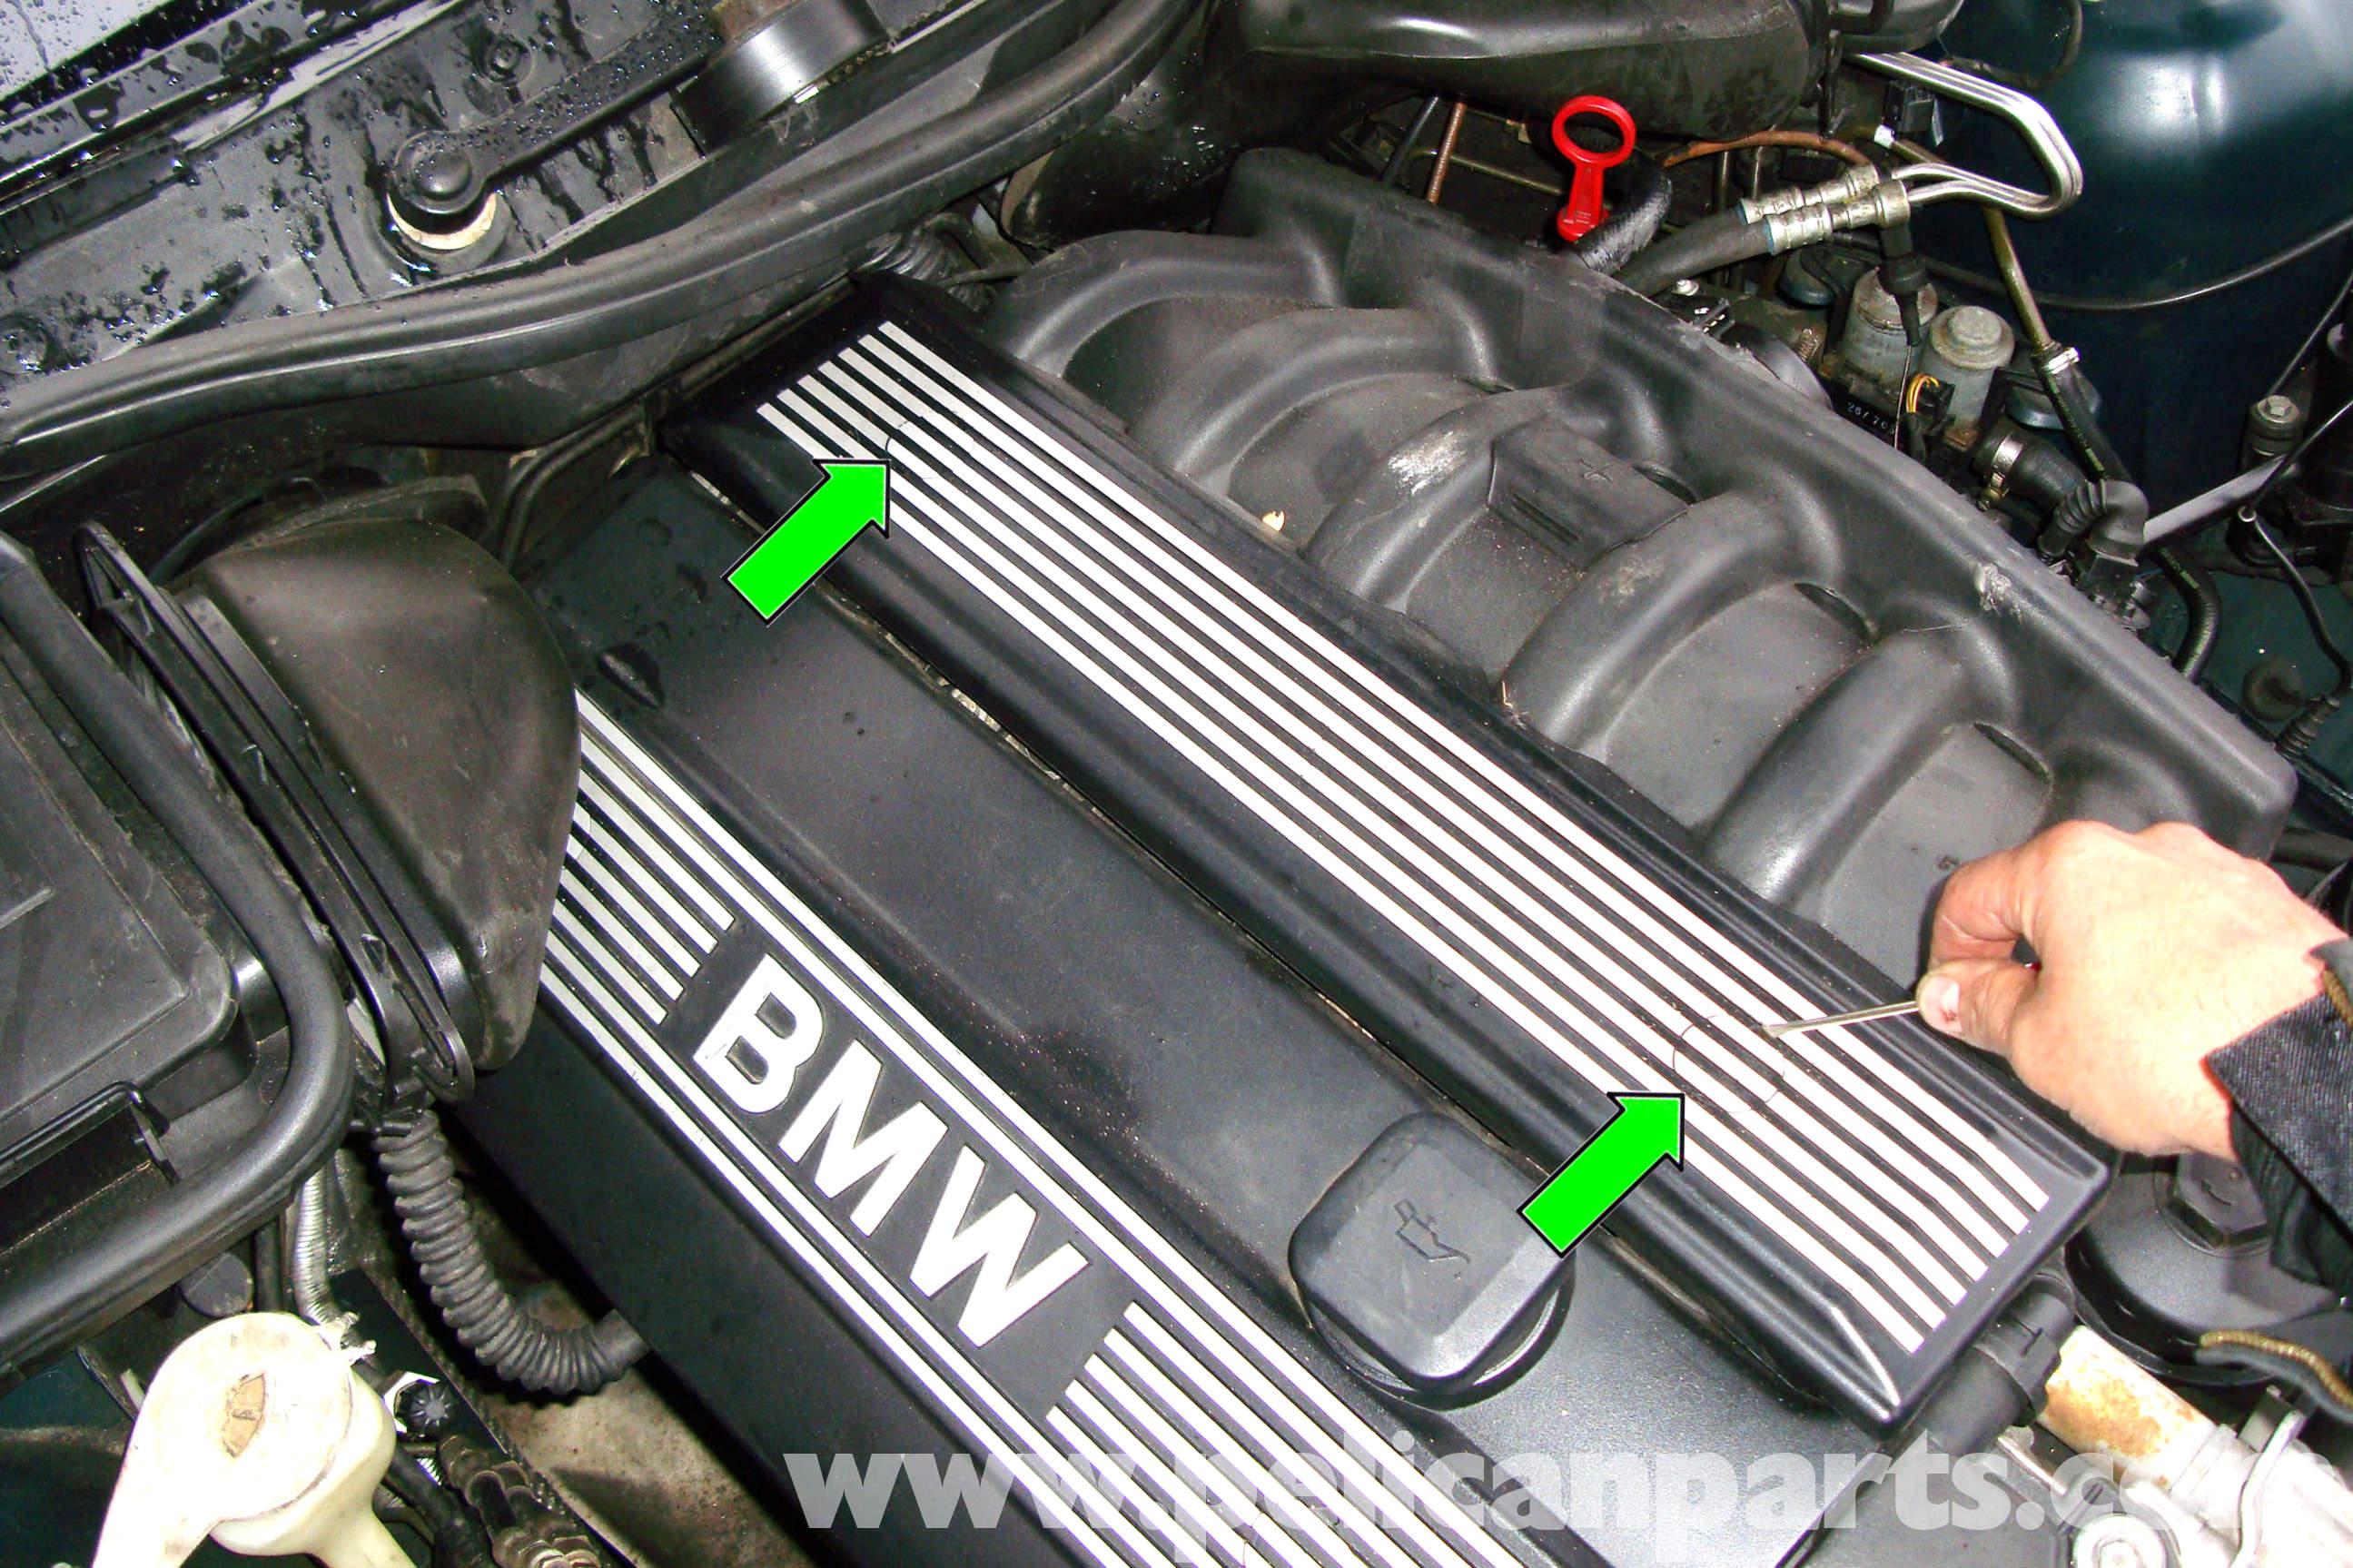 BMW E39 5-Series Fuel Injector Removal | 1997-2003 525i, 528i, 530i